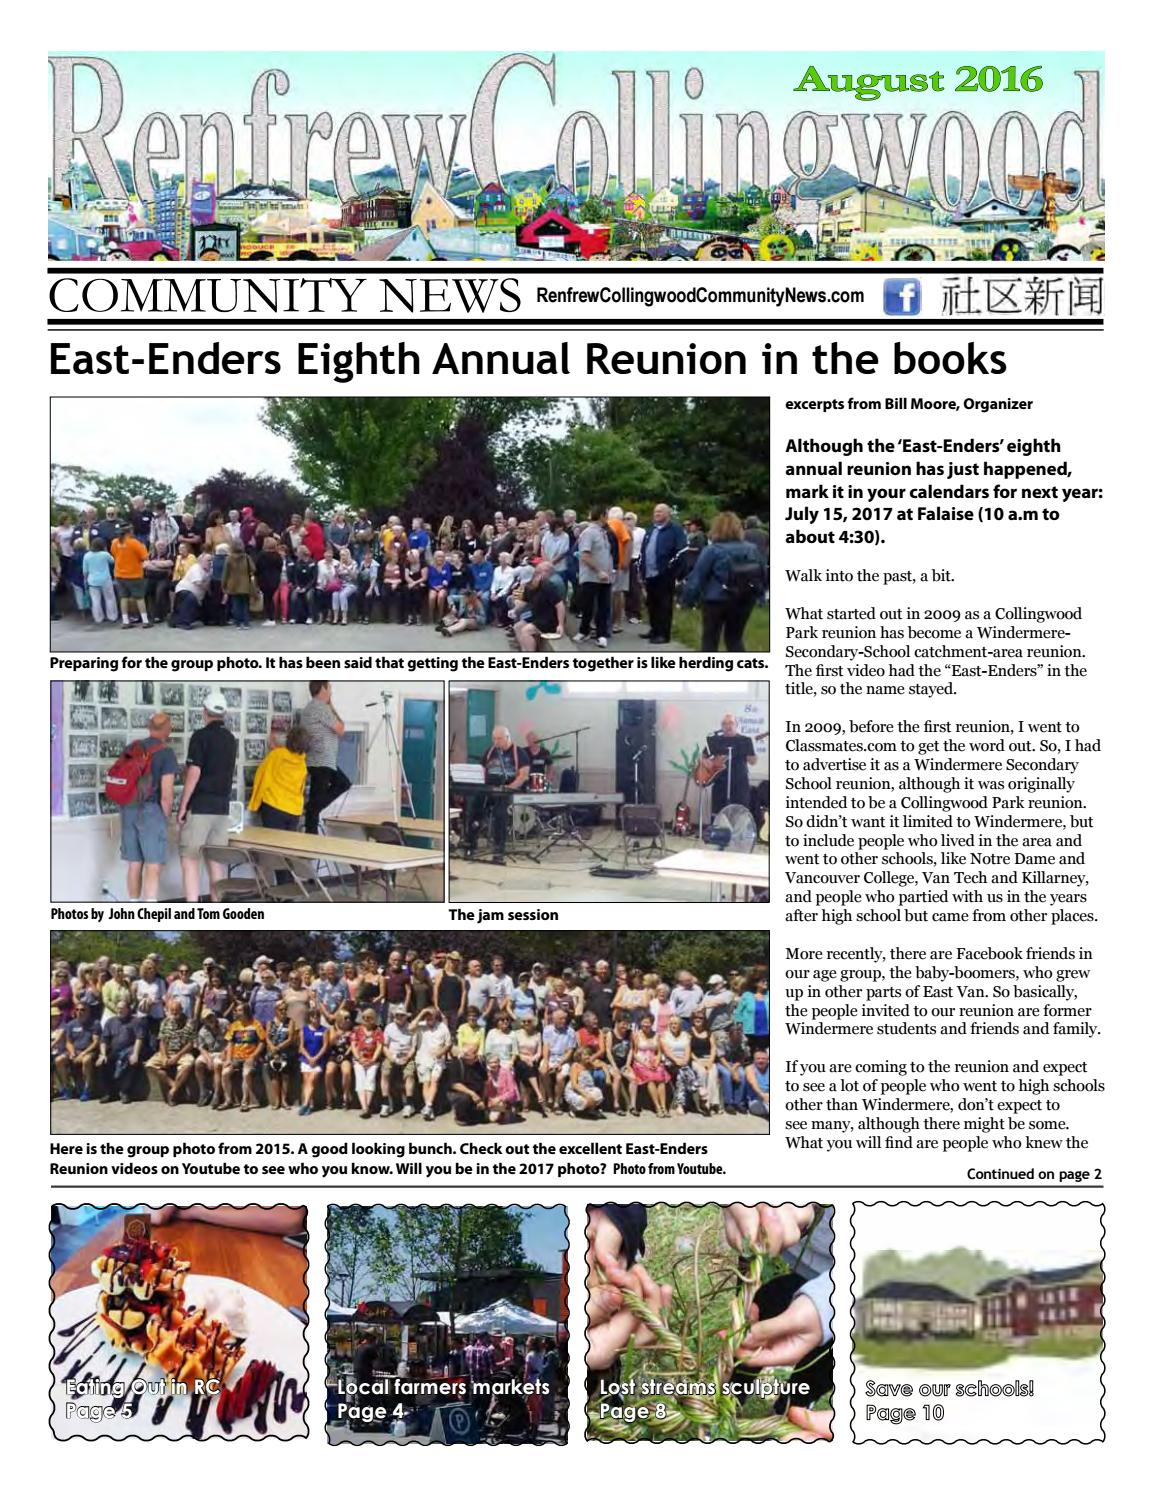 Renfrew-Collingwood Community News August 2016 by Renfrew-Collingwood Community News - issuu